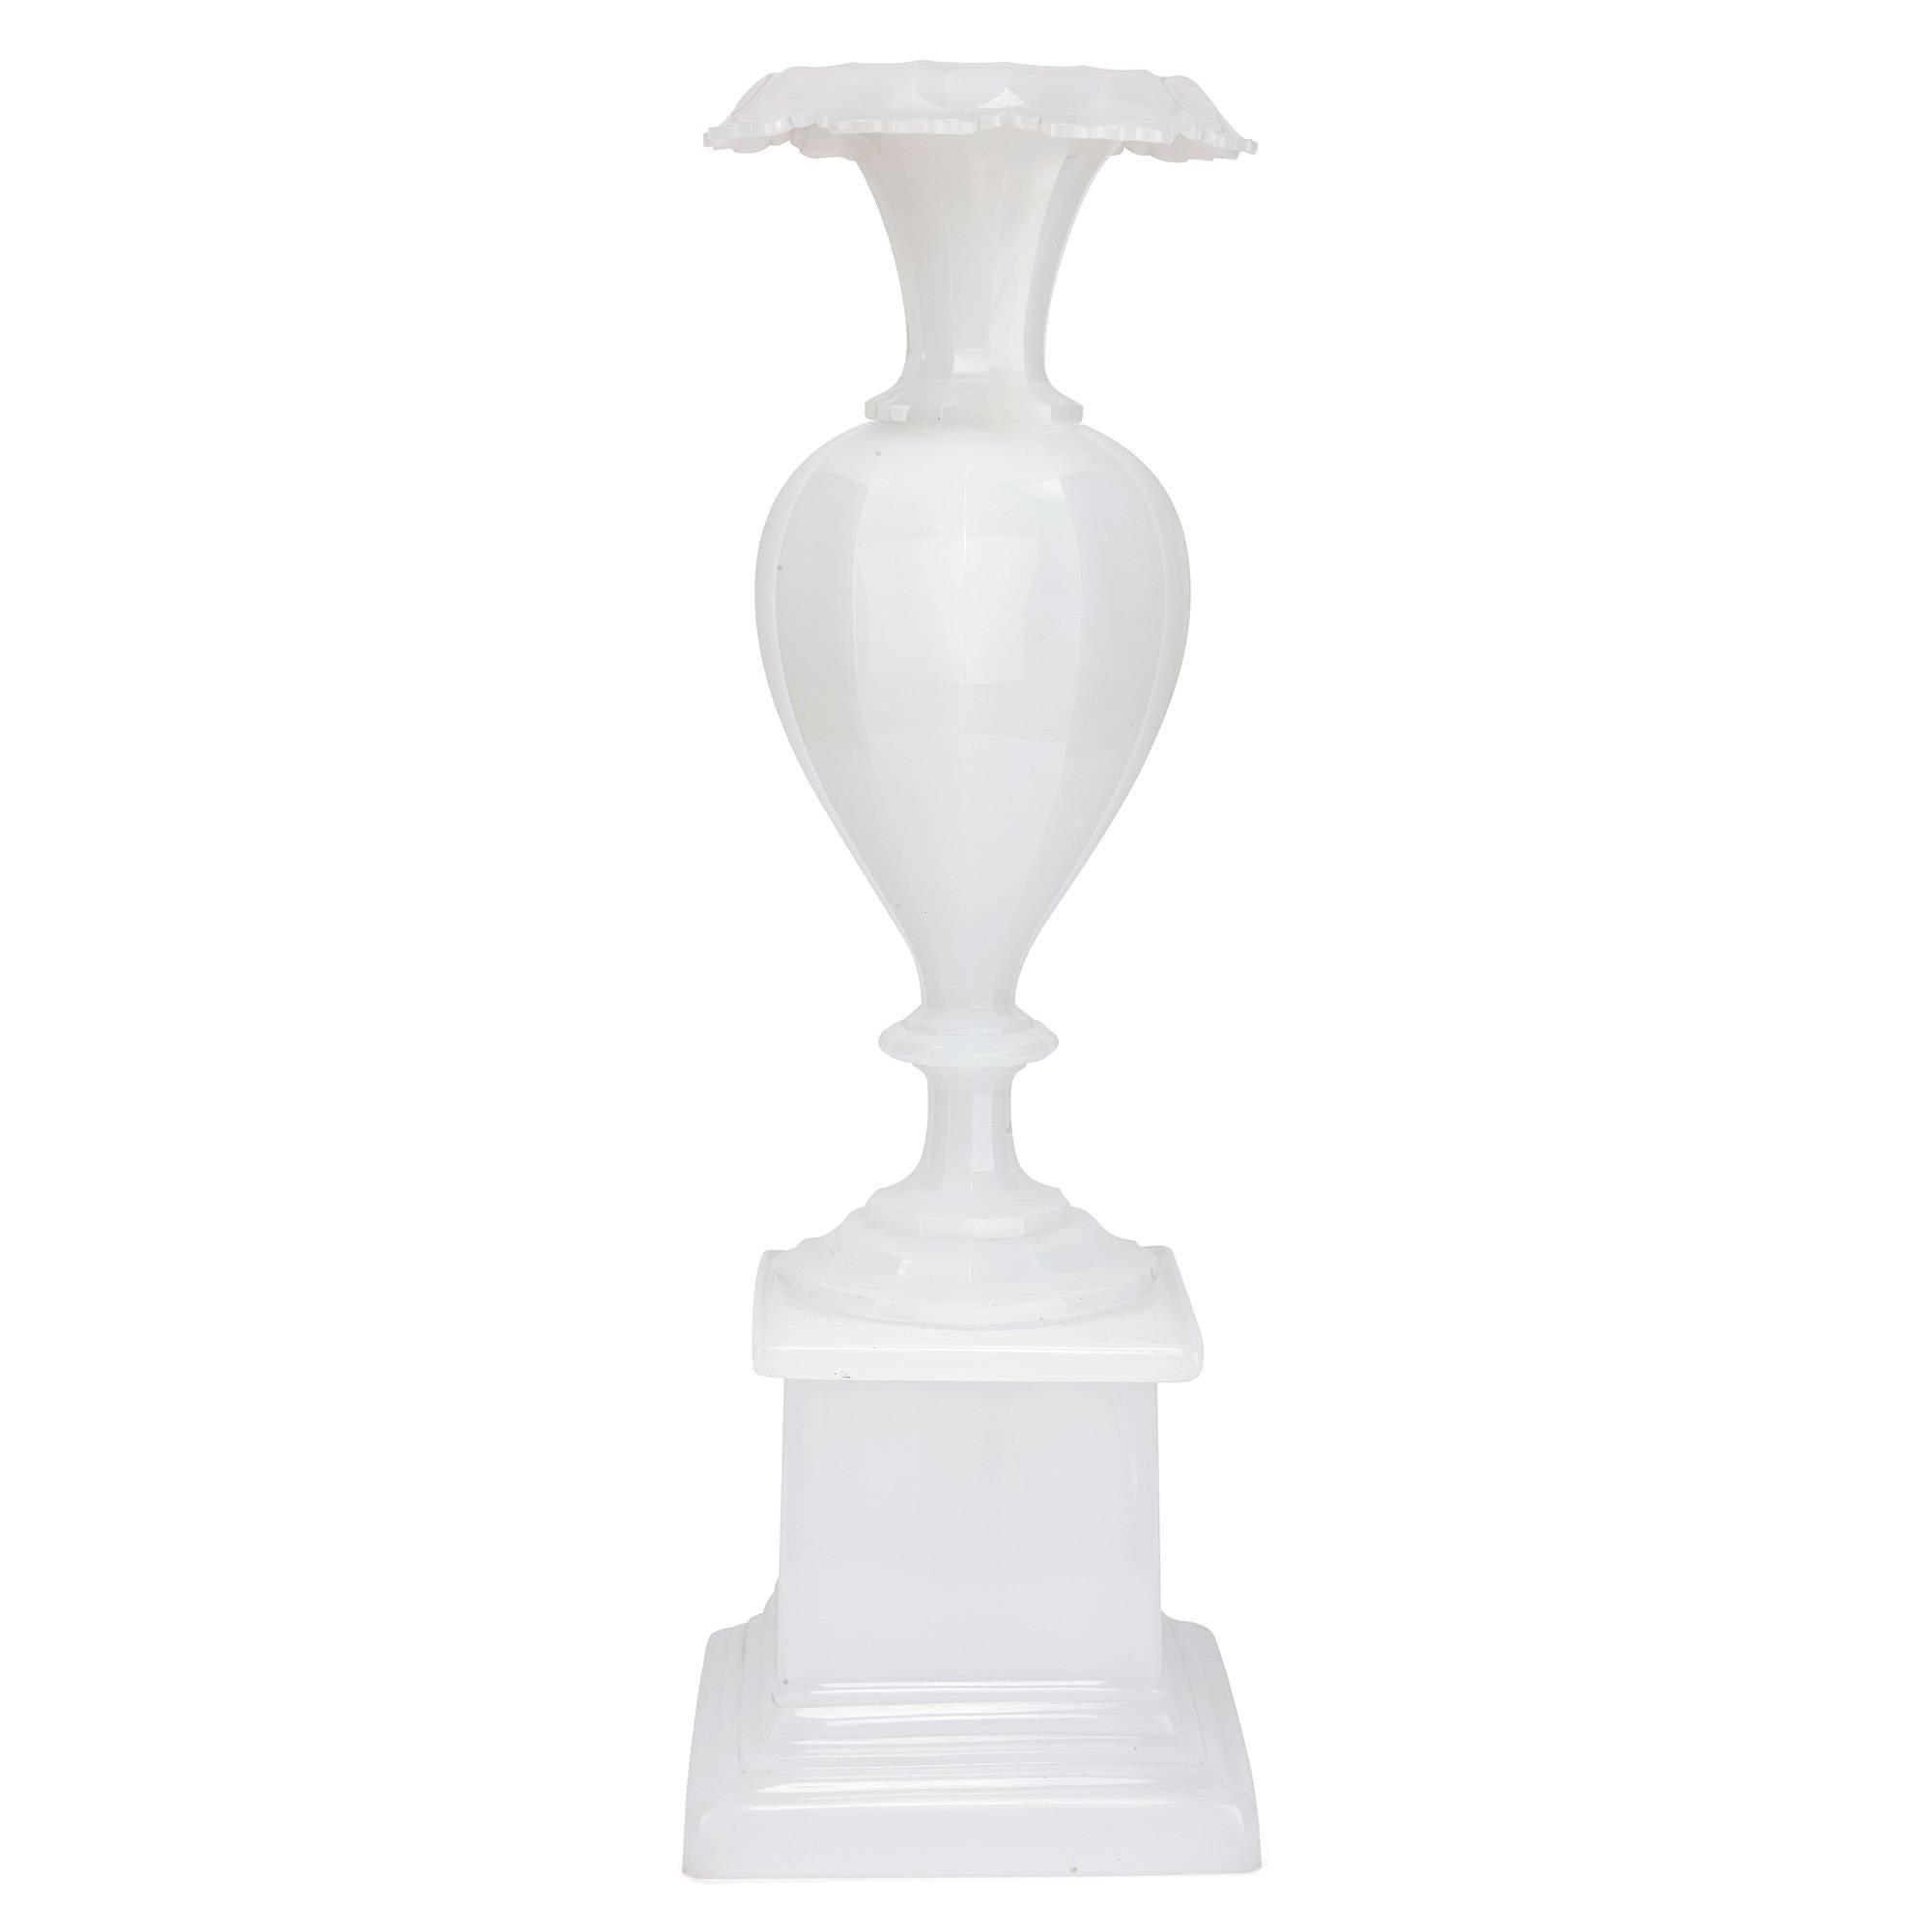 19th Century Bohemian Opalescent Glass Vase